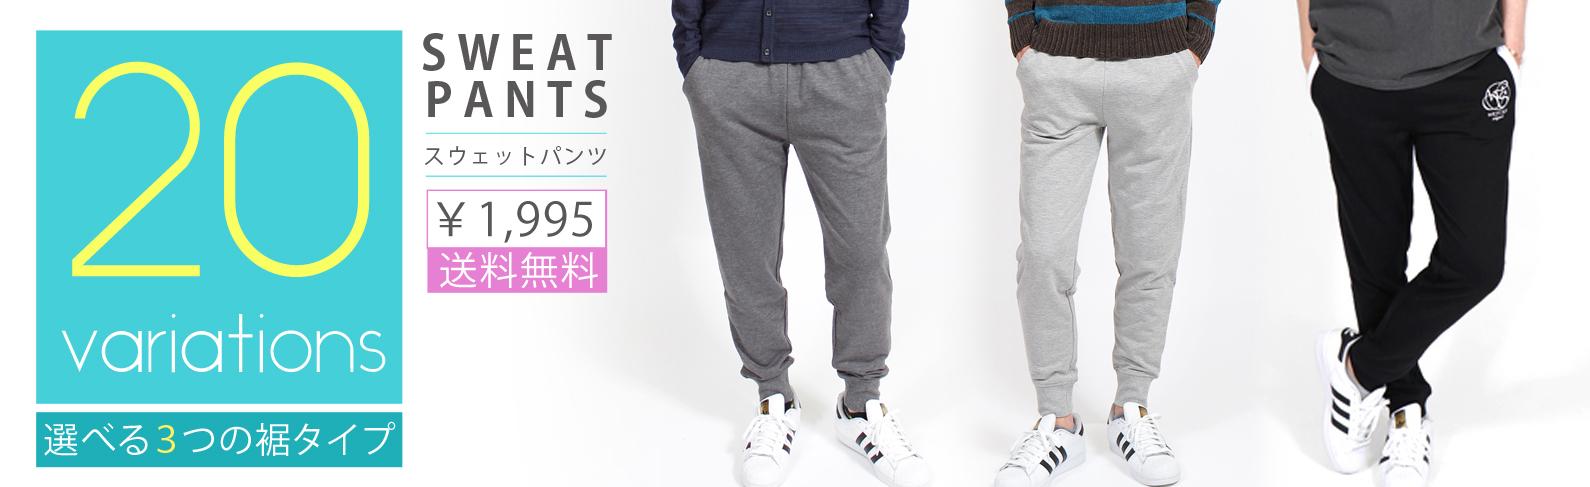 topbanner-sweatpants.jpg